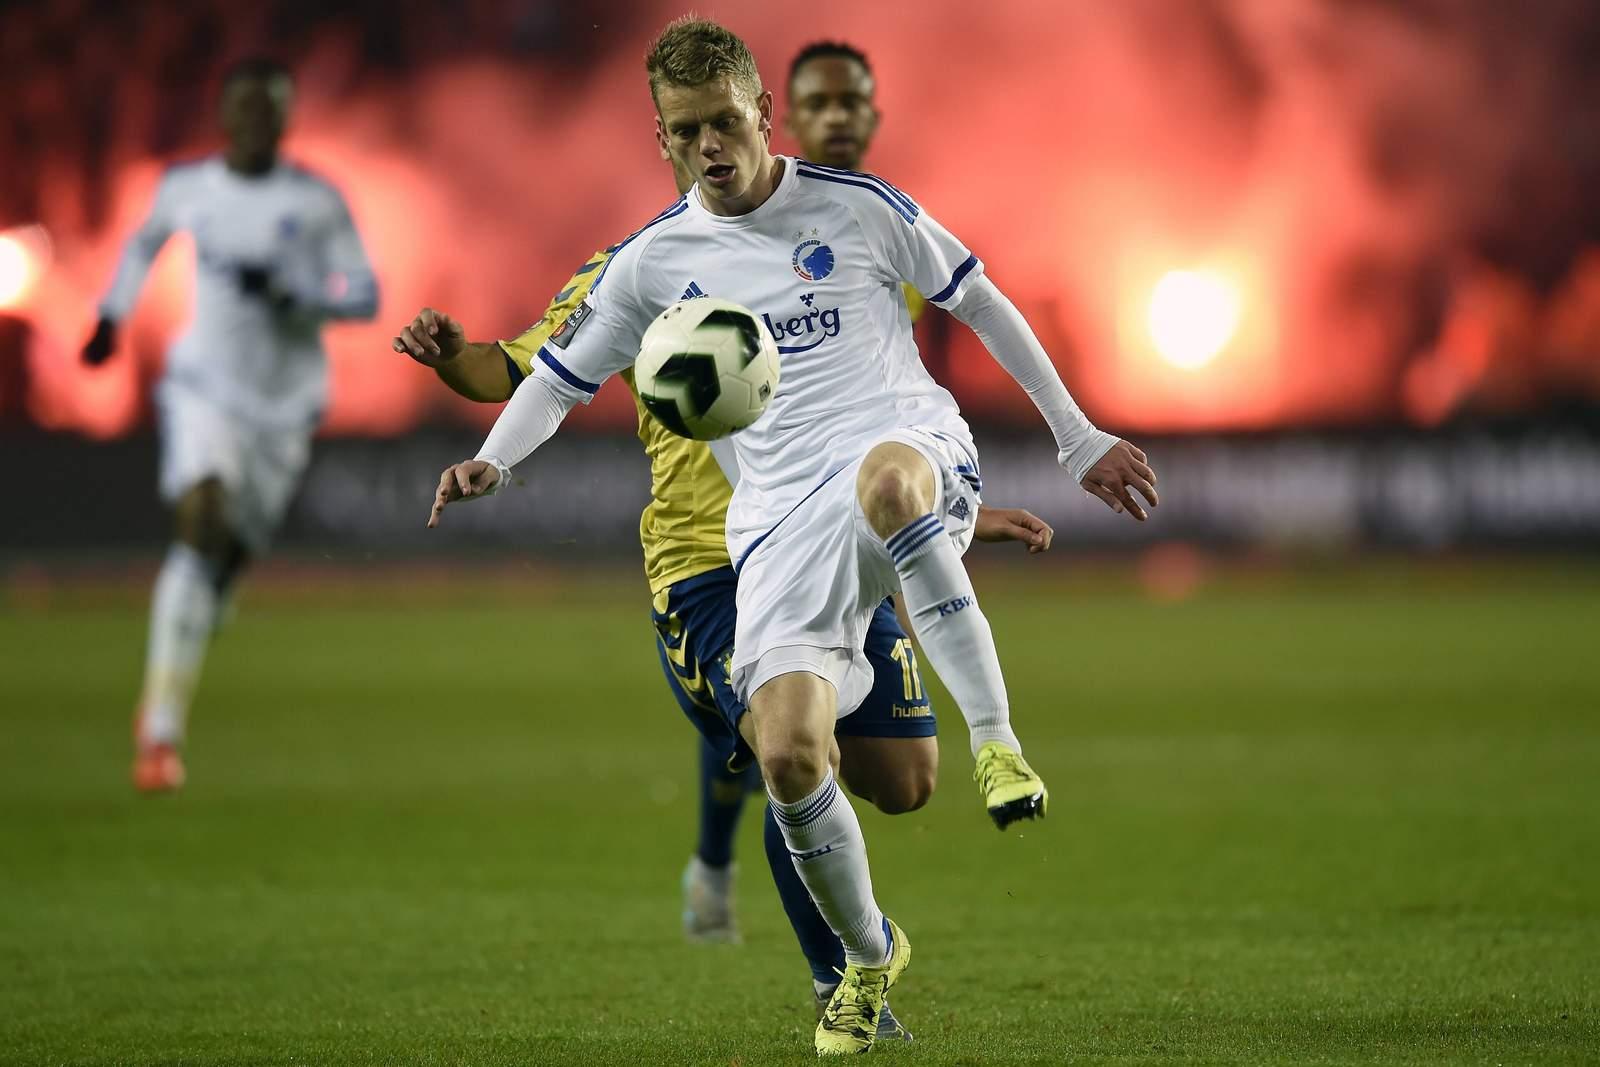 Kasper Kusk am Ball. Jetzt auf Porto gegen Kopenhagen wetten!